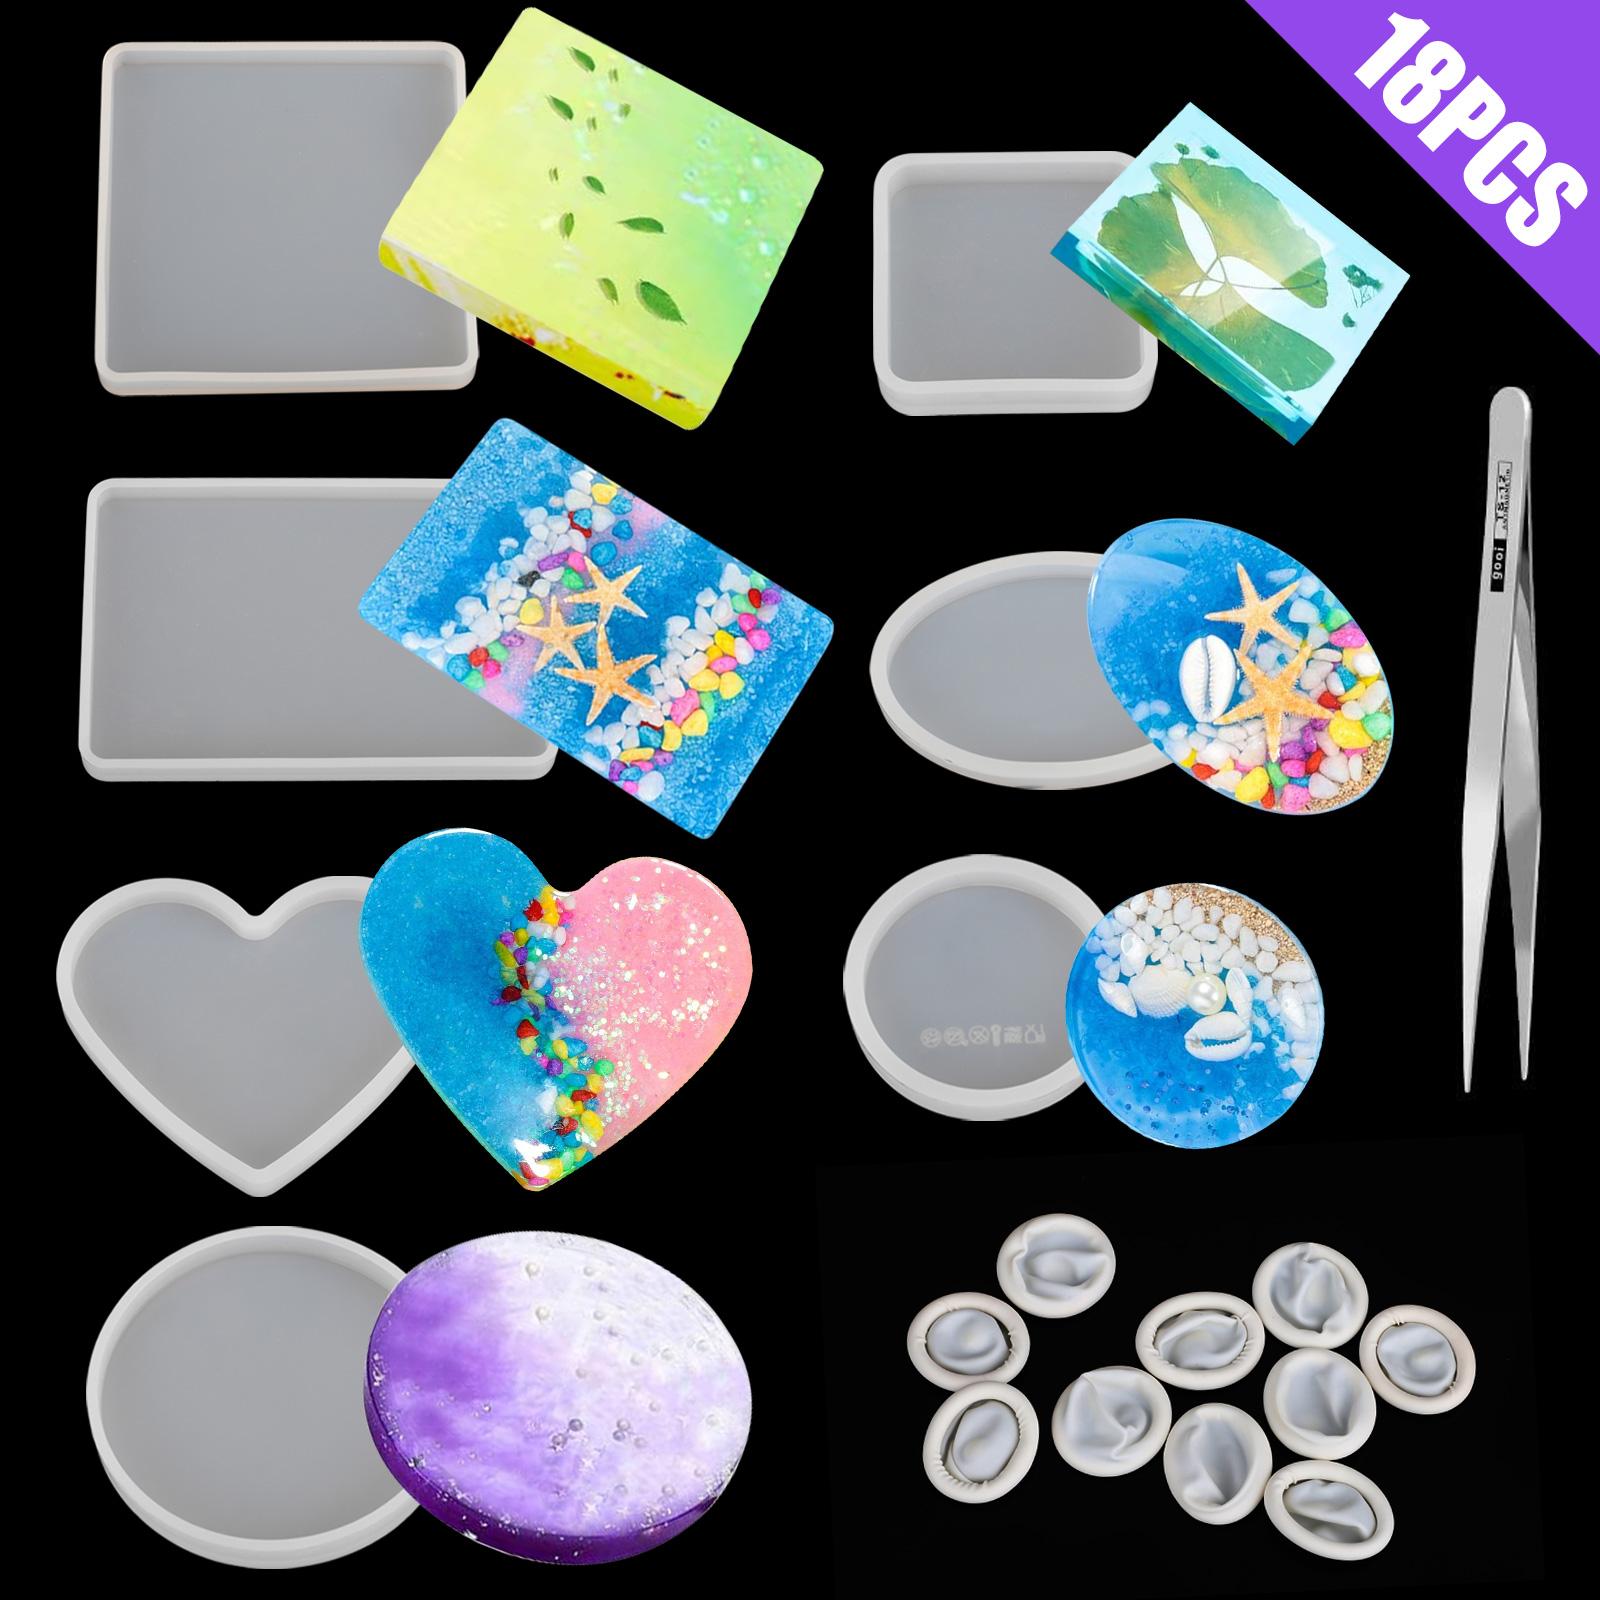 Silicone-Resin-Molds-Epoxy-Casting-Art-Coaster-Ashtray-Bowl-Mat-DIY-Craft-Tool